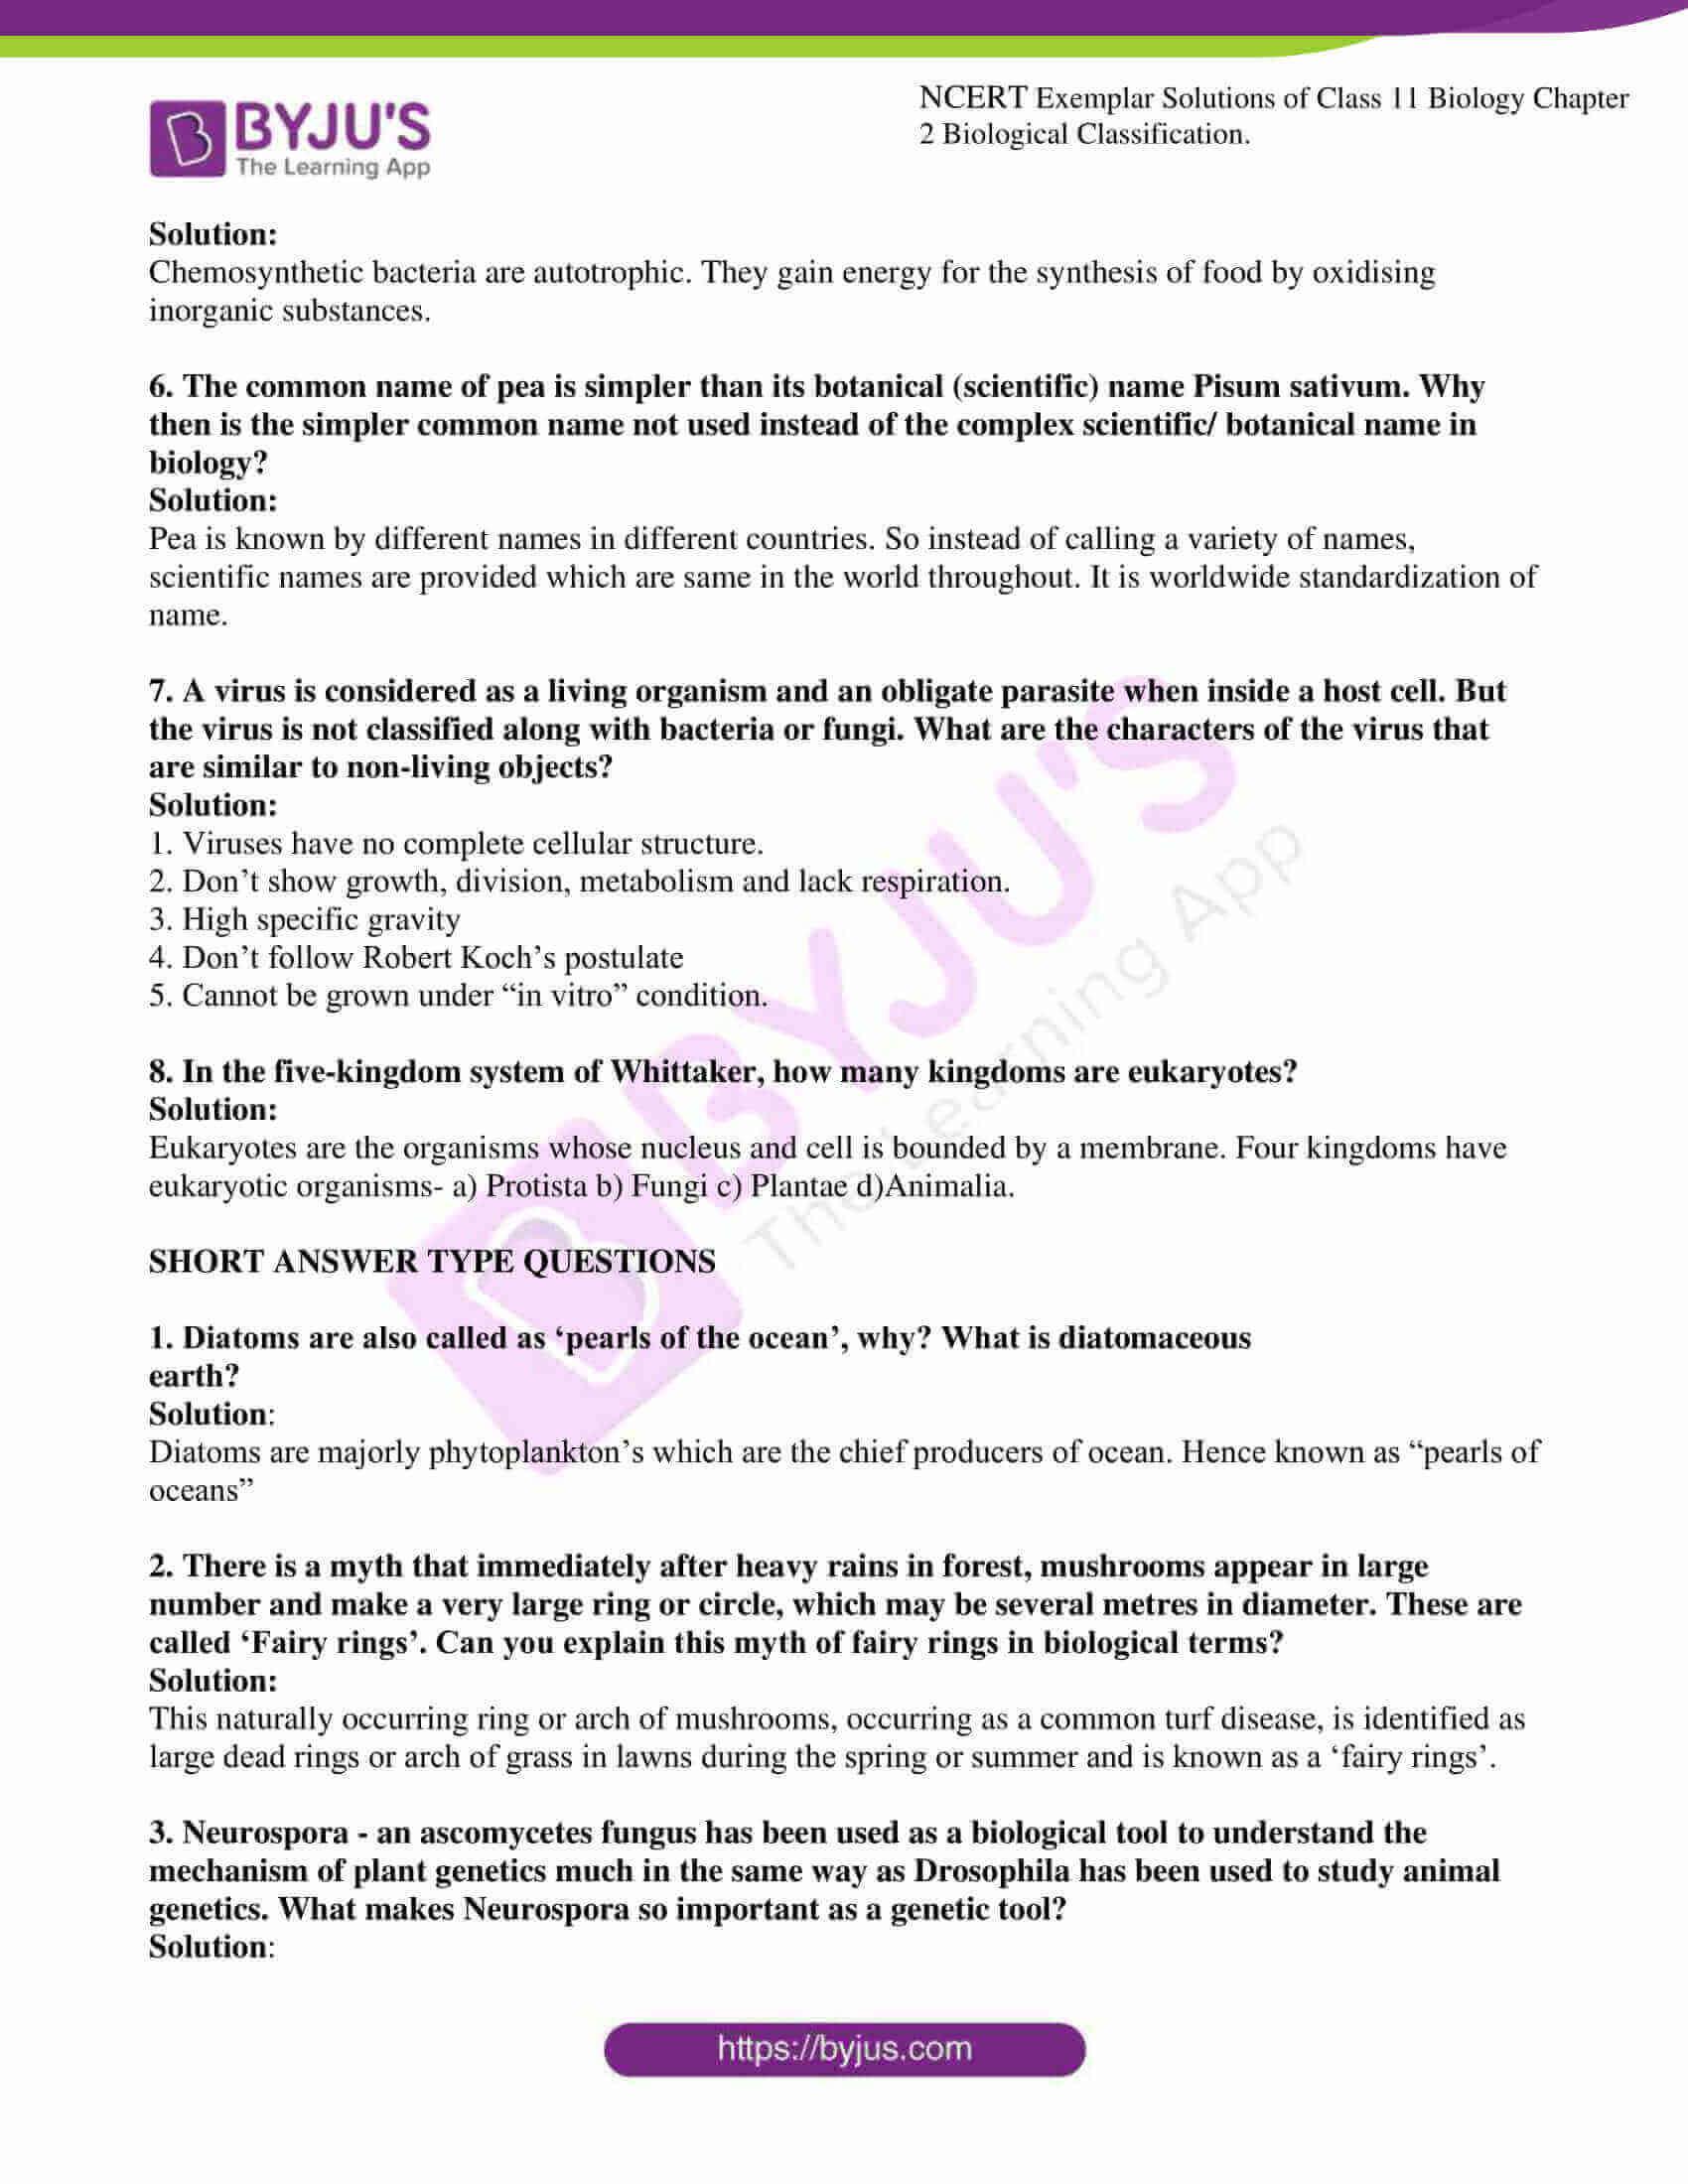 ncert exemplar solutions for class 11 bio chapter 2 4